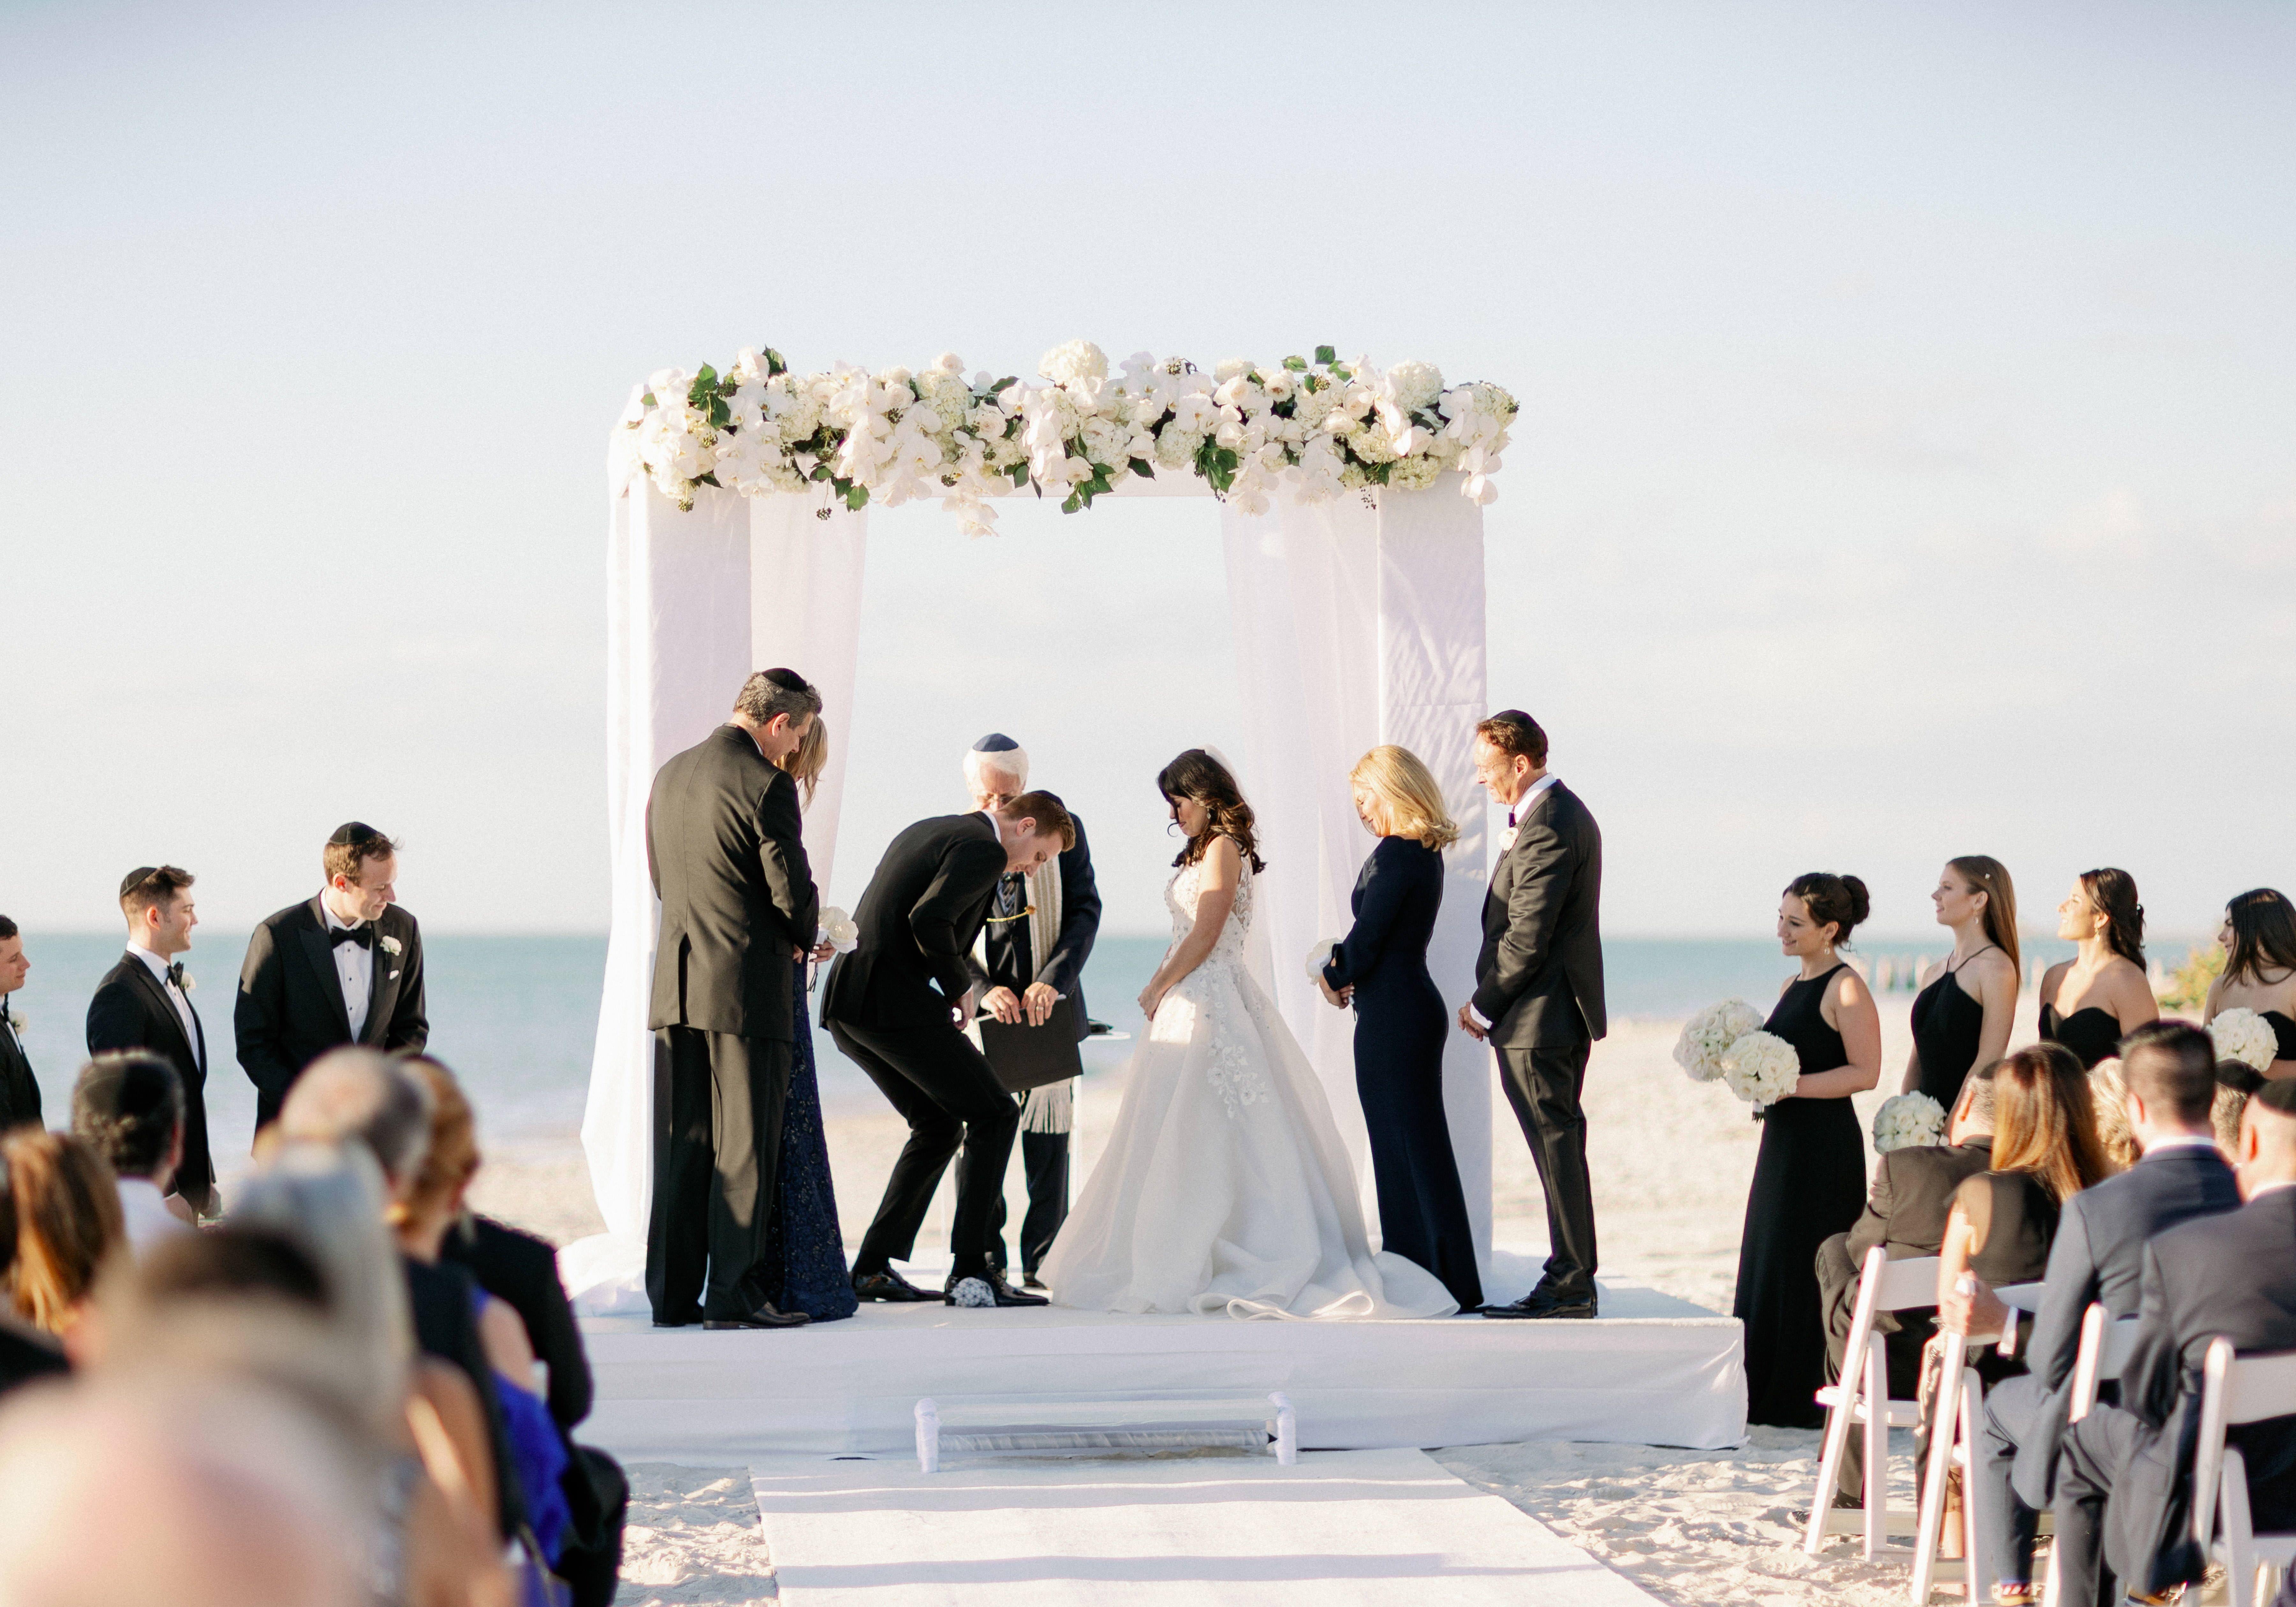 Jewish Wedding Ceremony In 2020 Jewish Wedding Ceremony Destination Wedding Planner Wedding